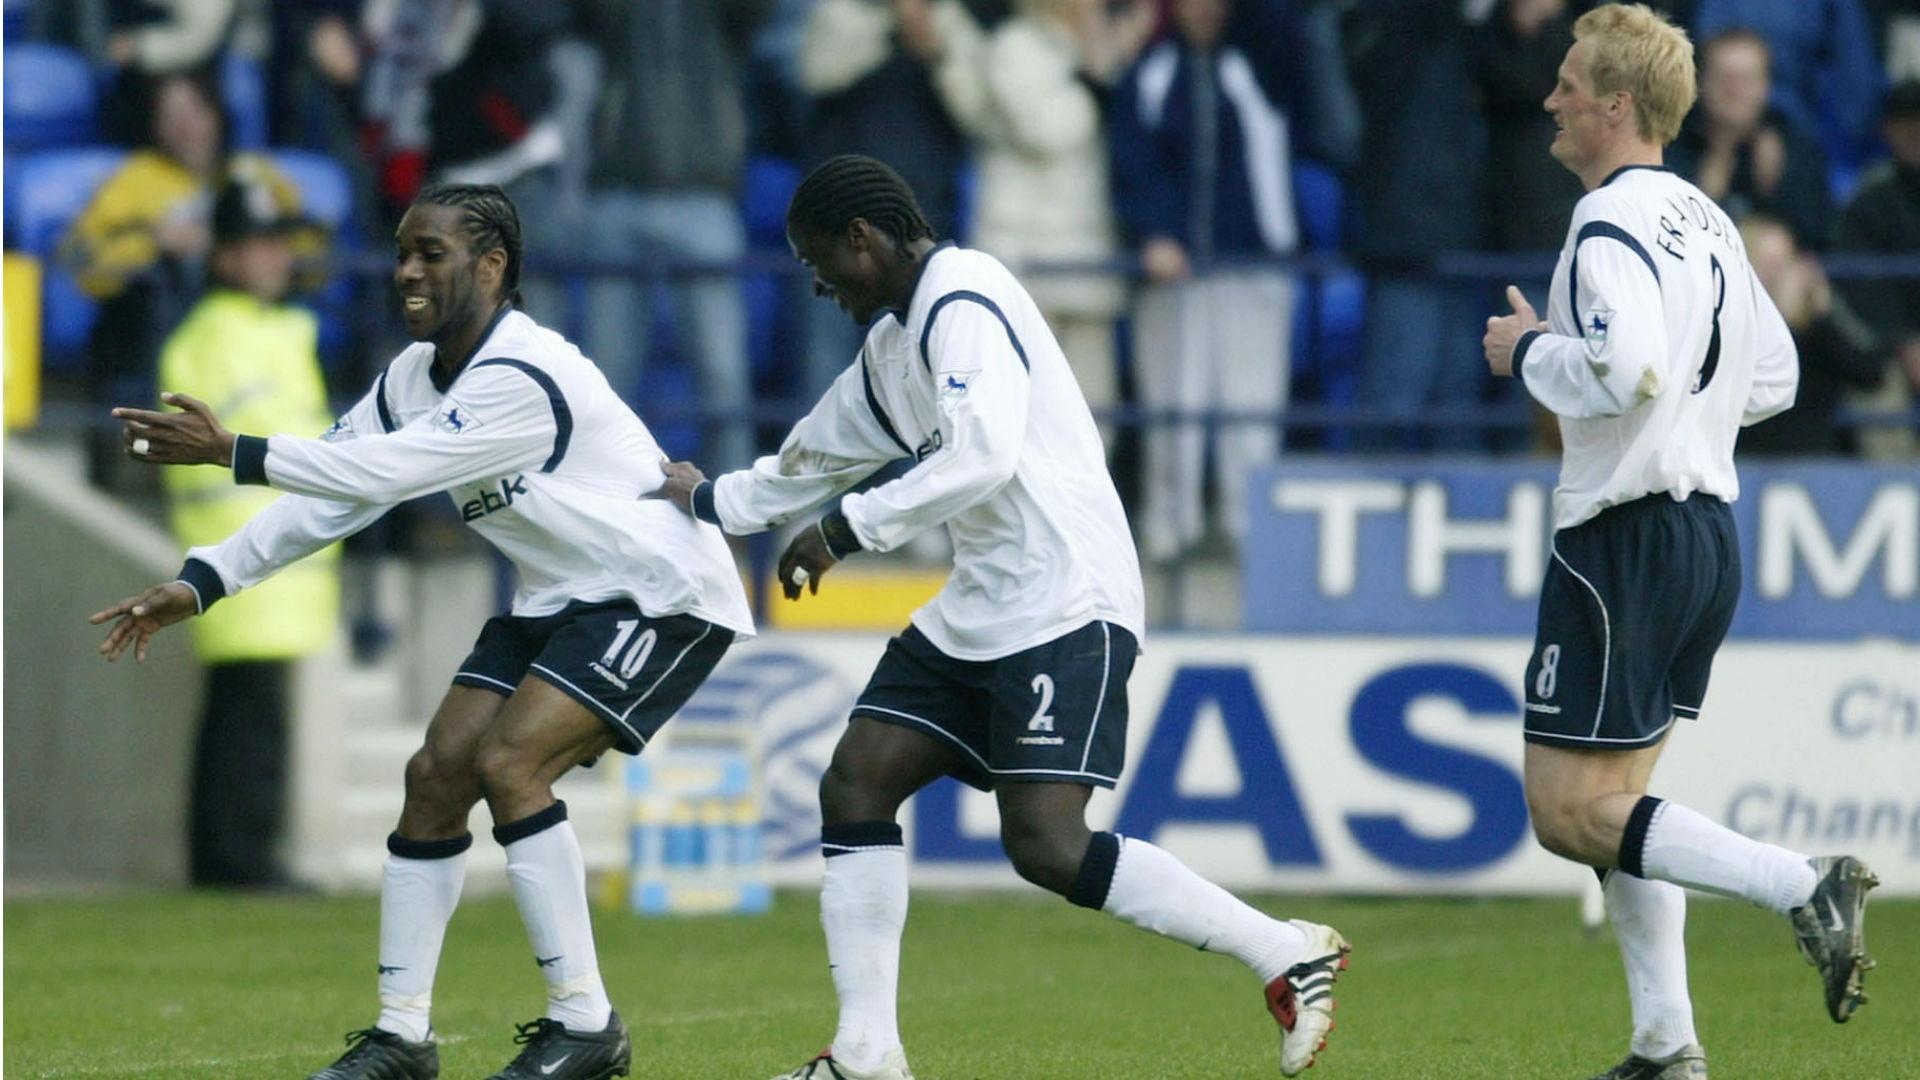 WATCH: Okocha, Taarabt, Zaha - Rio Ferdinand on Africa's Premier League Magicians